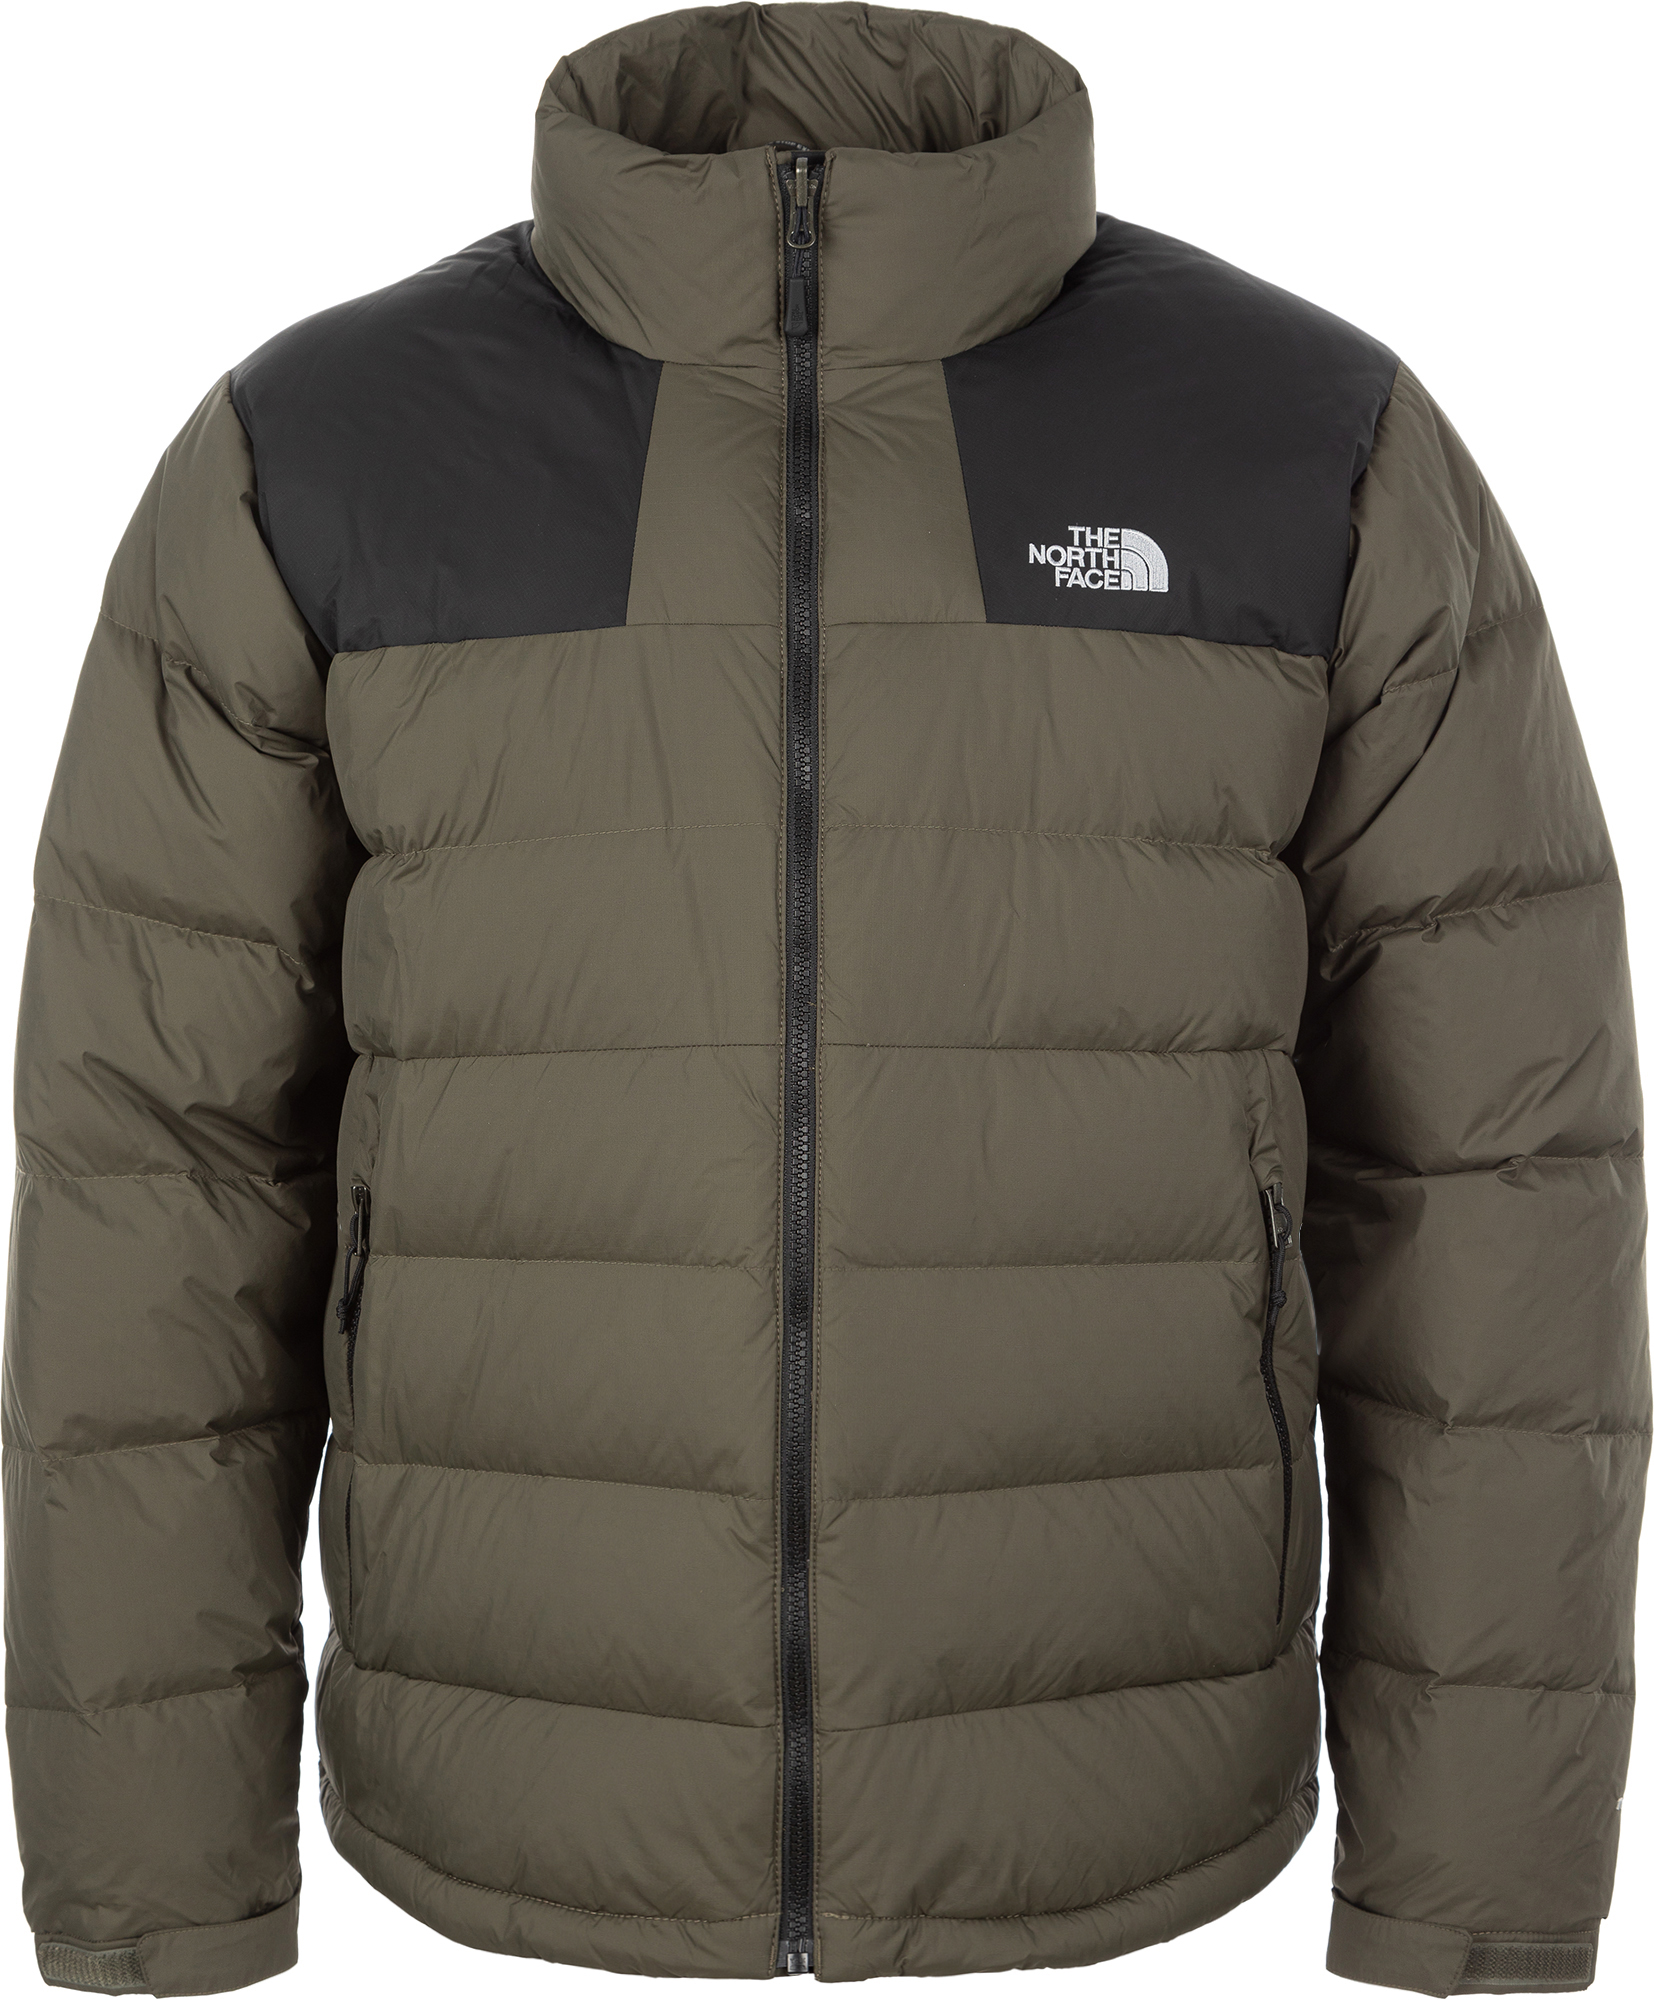 The North Face Куртка пуховая мужская The North Face Massif, размер 50